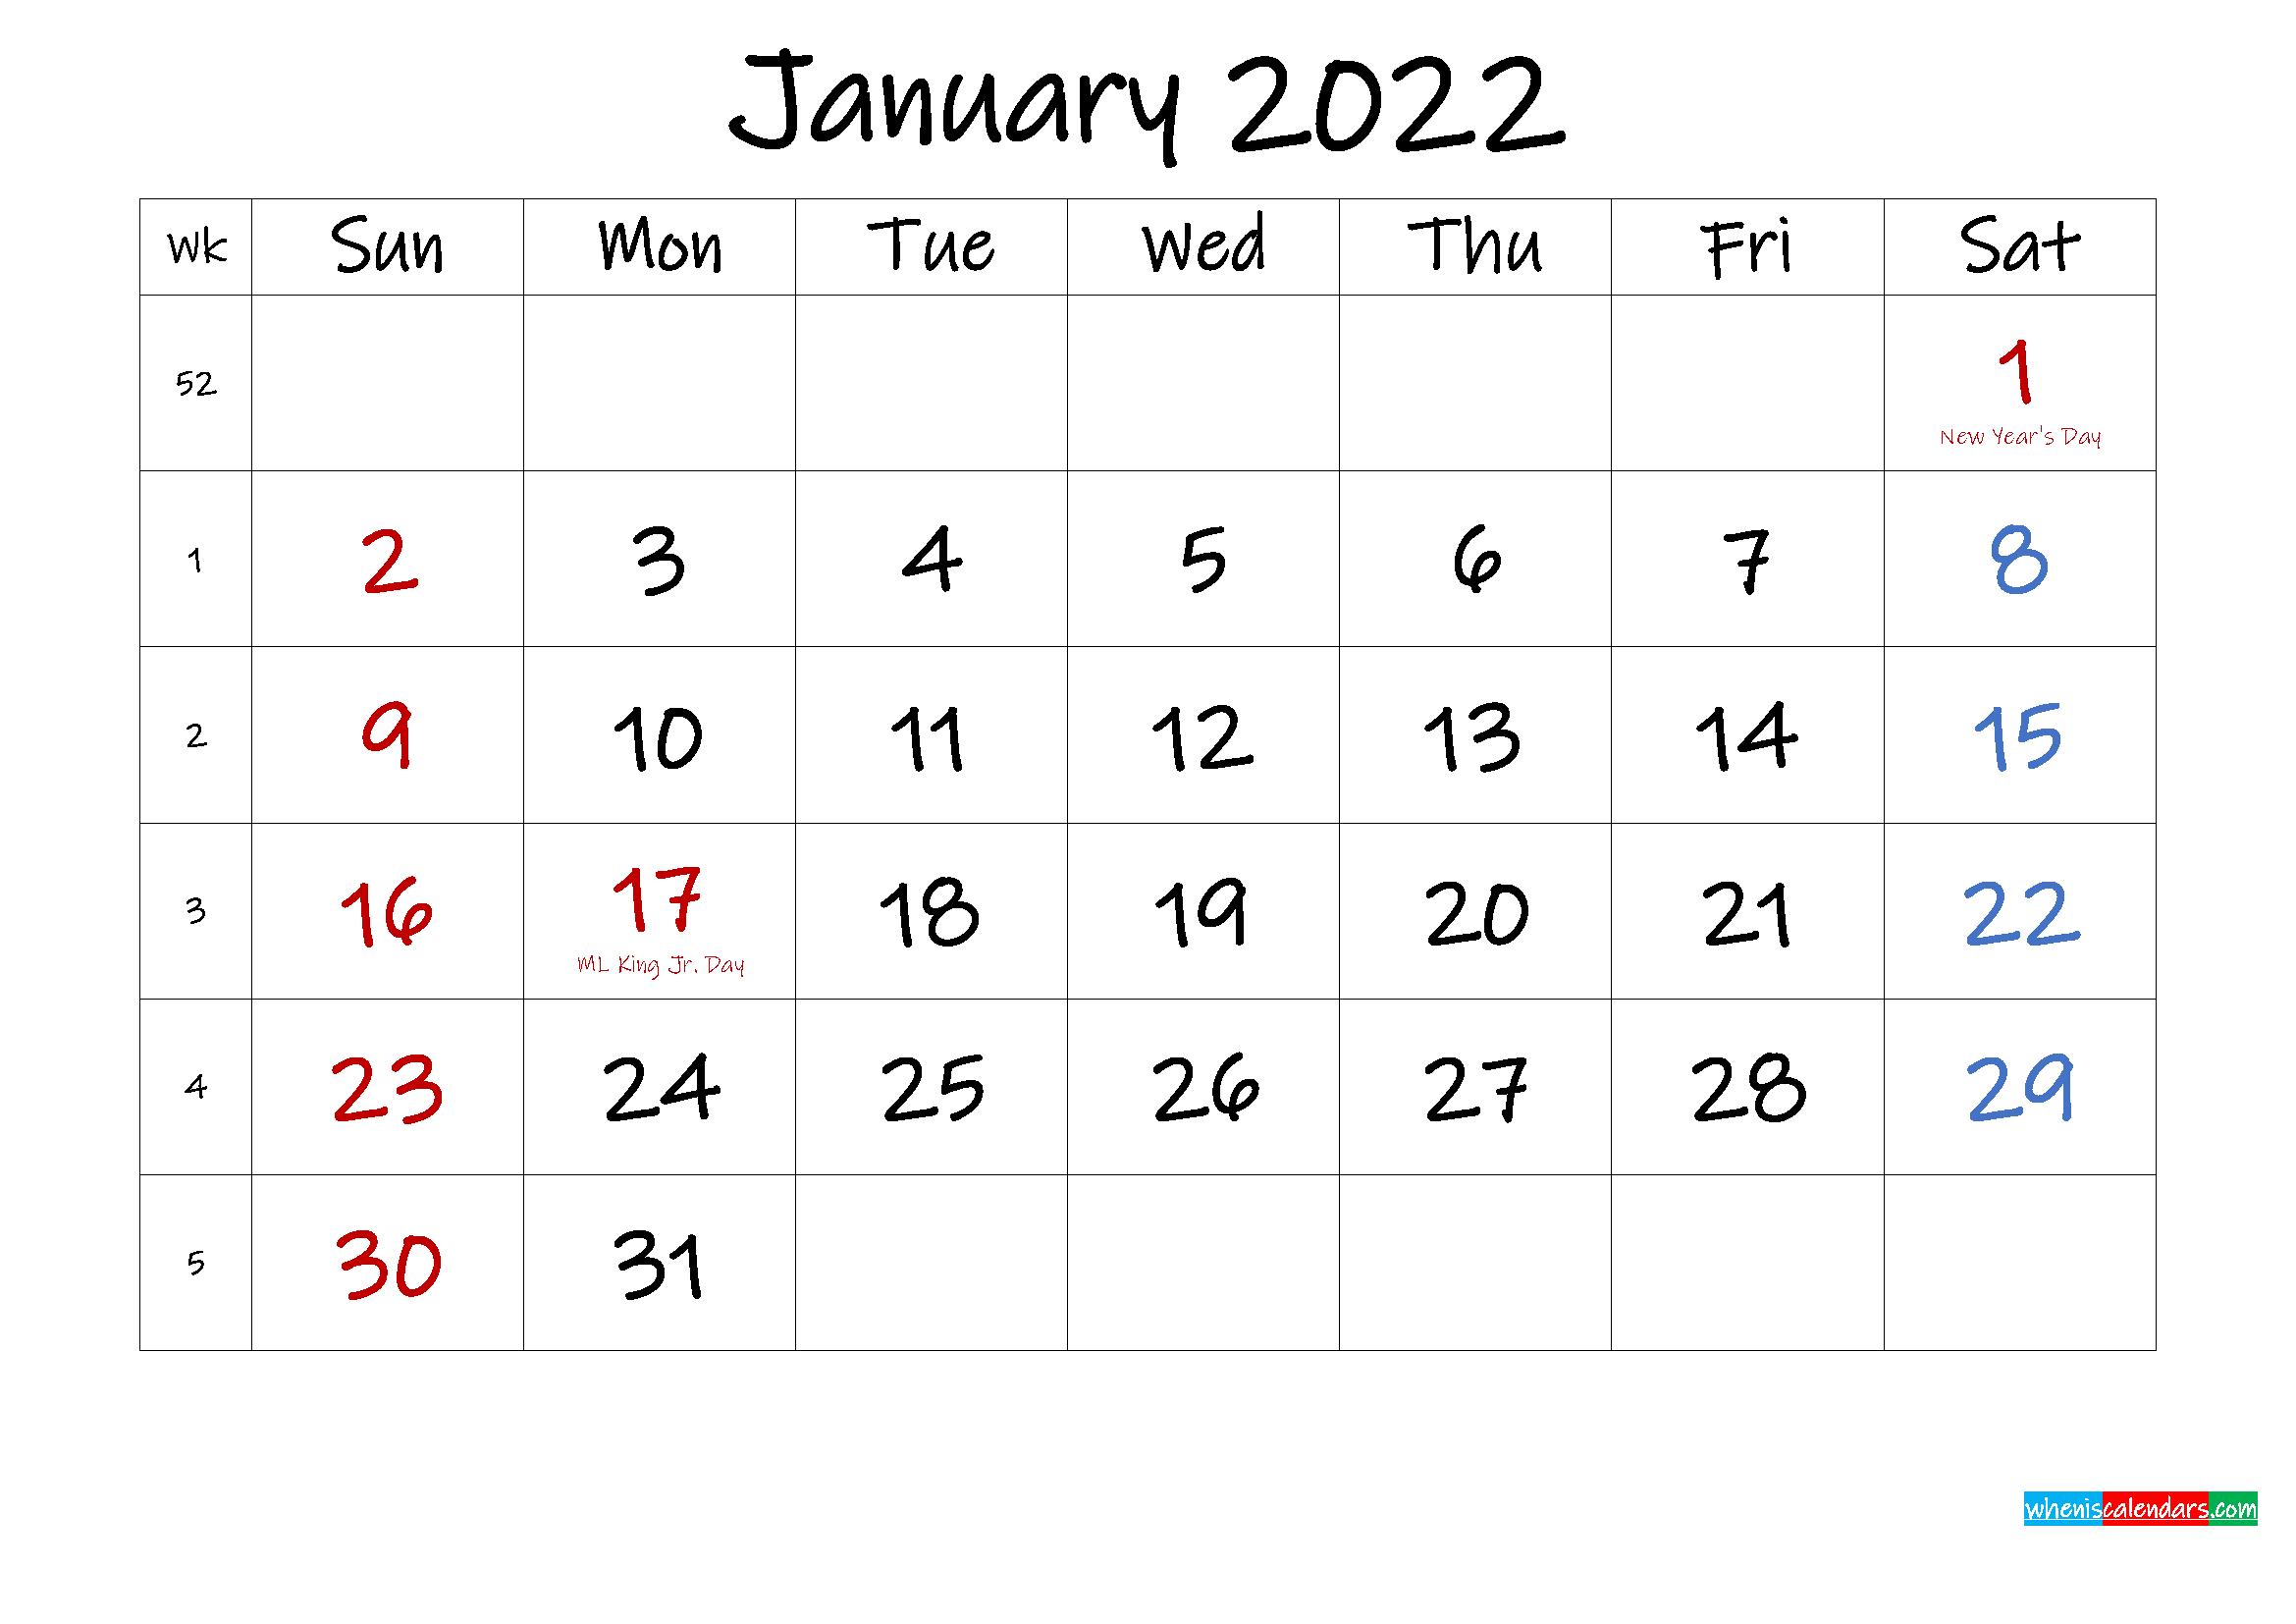 January 2022 Free Printable Calendar With Holidays Regarding Monthly Calendar 2022 January